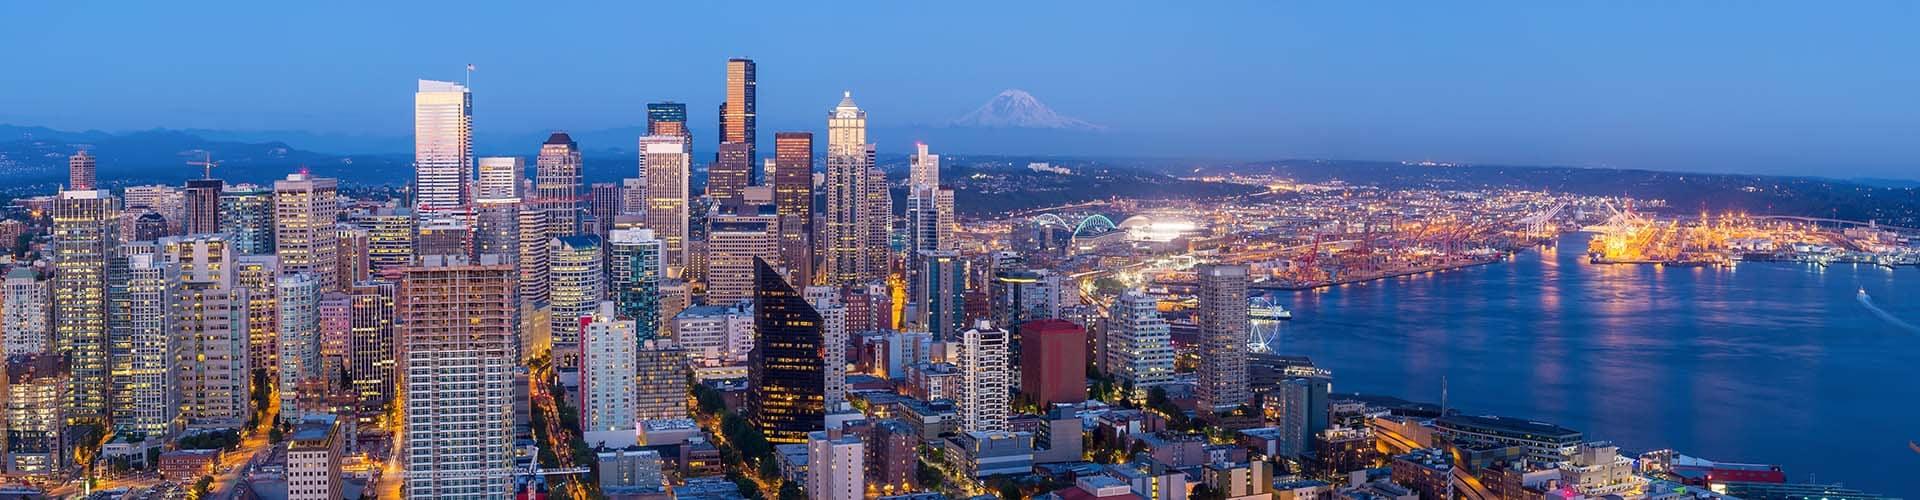 Honda Of Kirkland Lease Return Center. Seattle Skyline Panorama